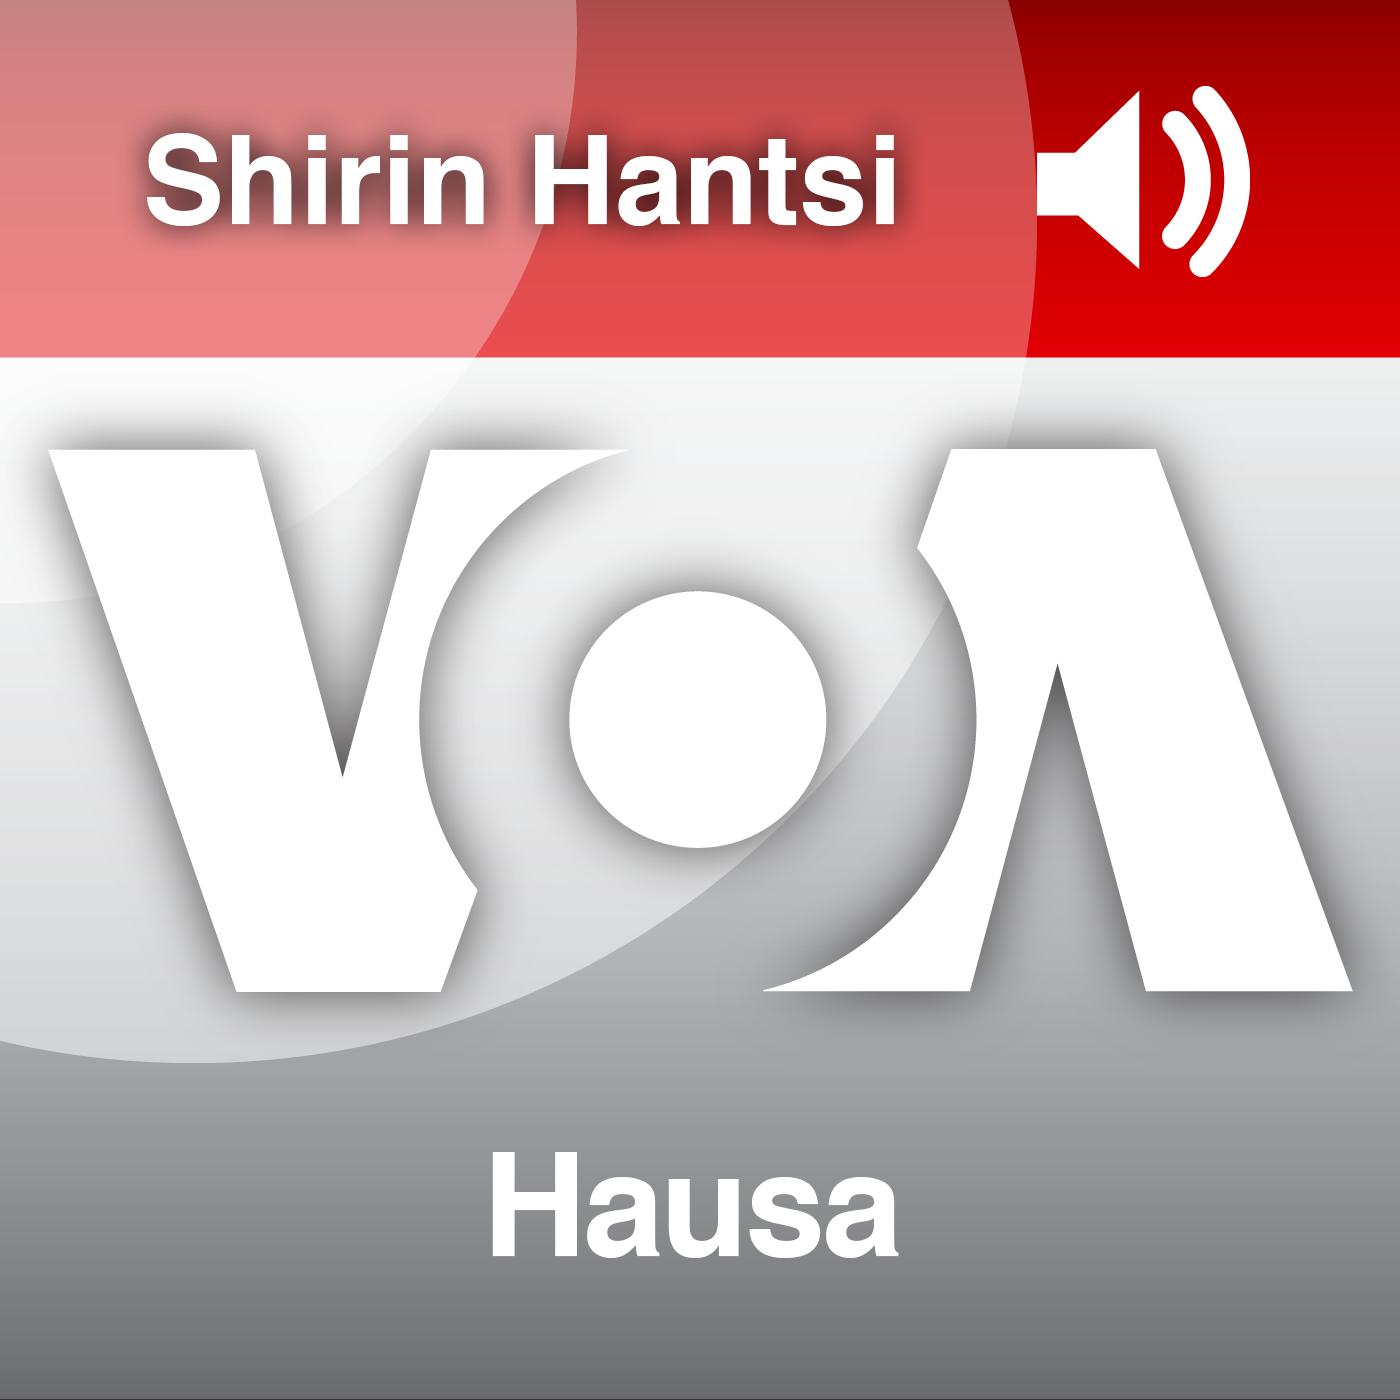 Shirin Hantsi - Voice of America